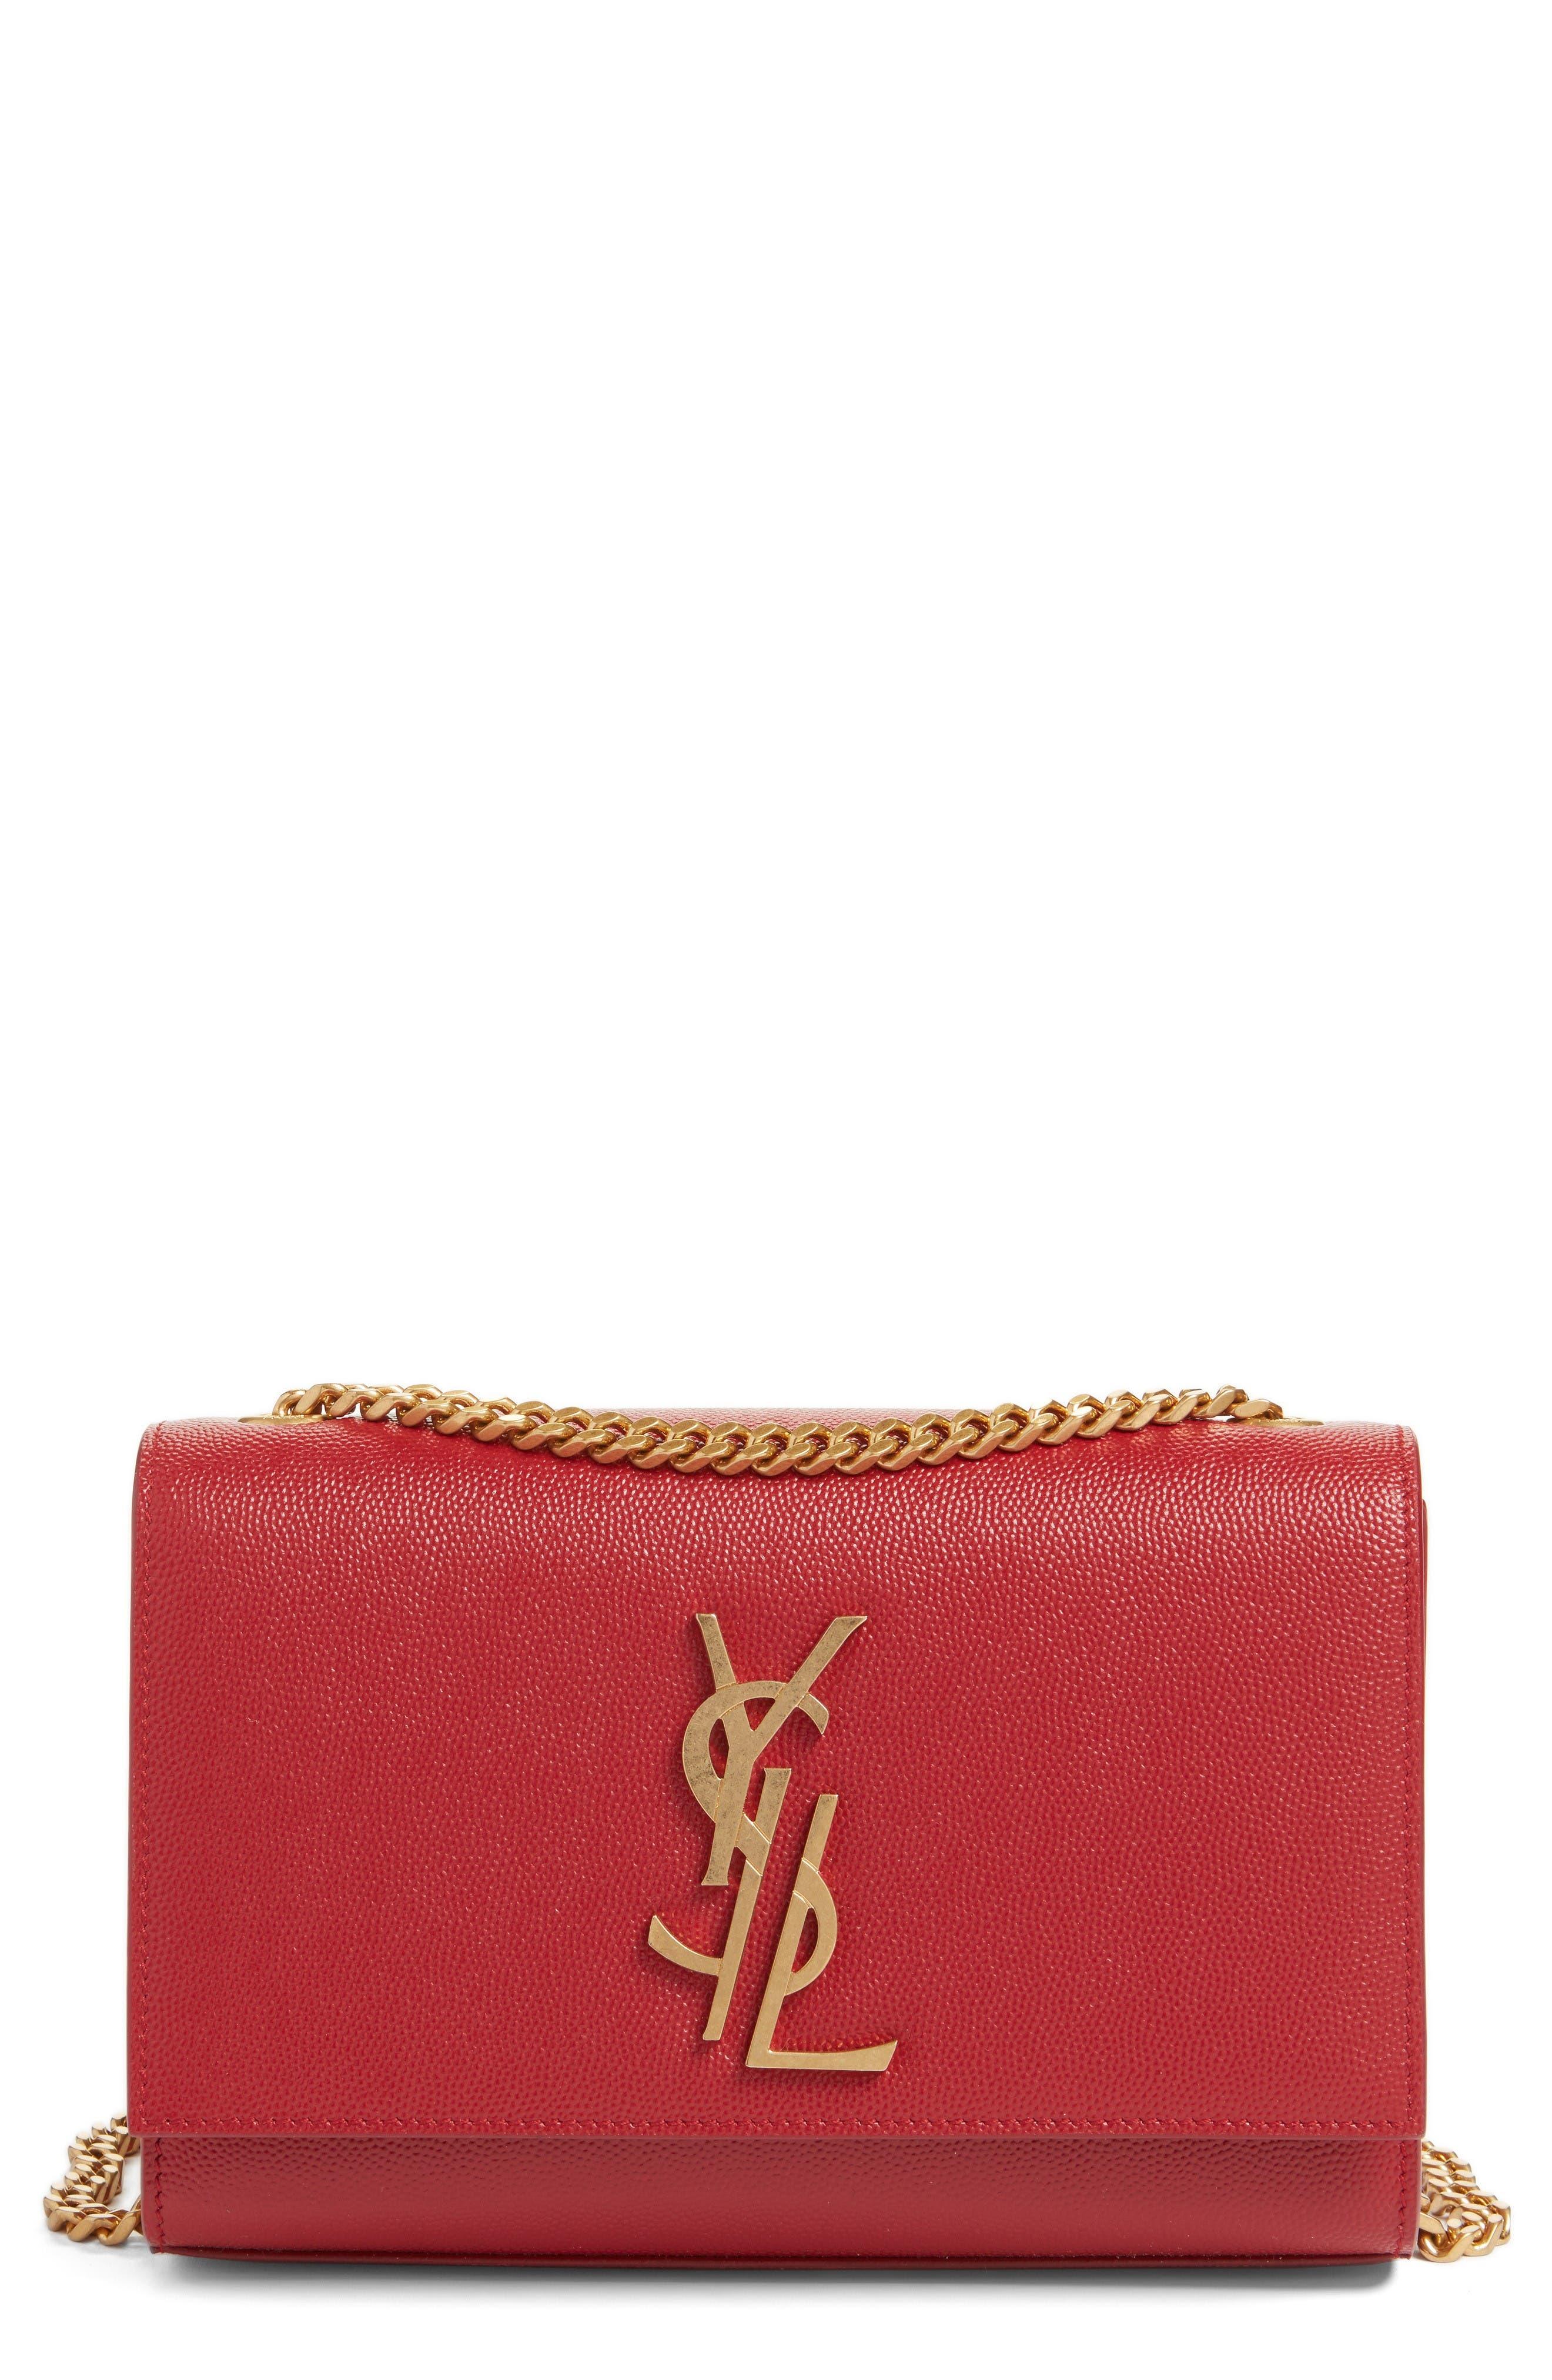 Main Image - Saint Laurent Small Kate Calfskin Leather Crossbody Bag